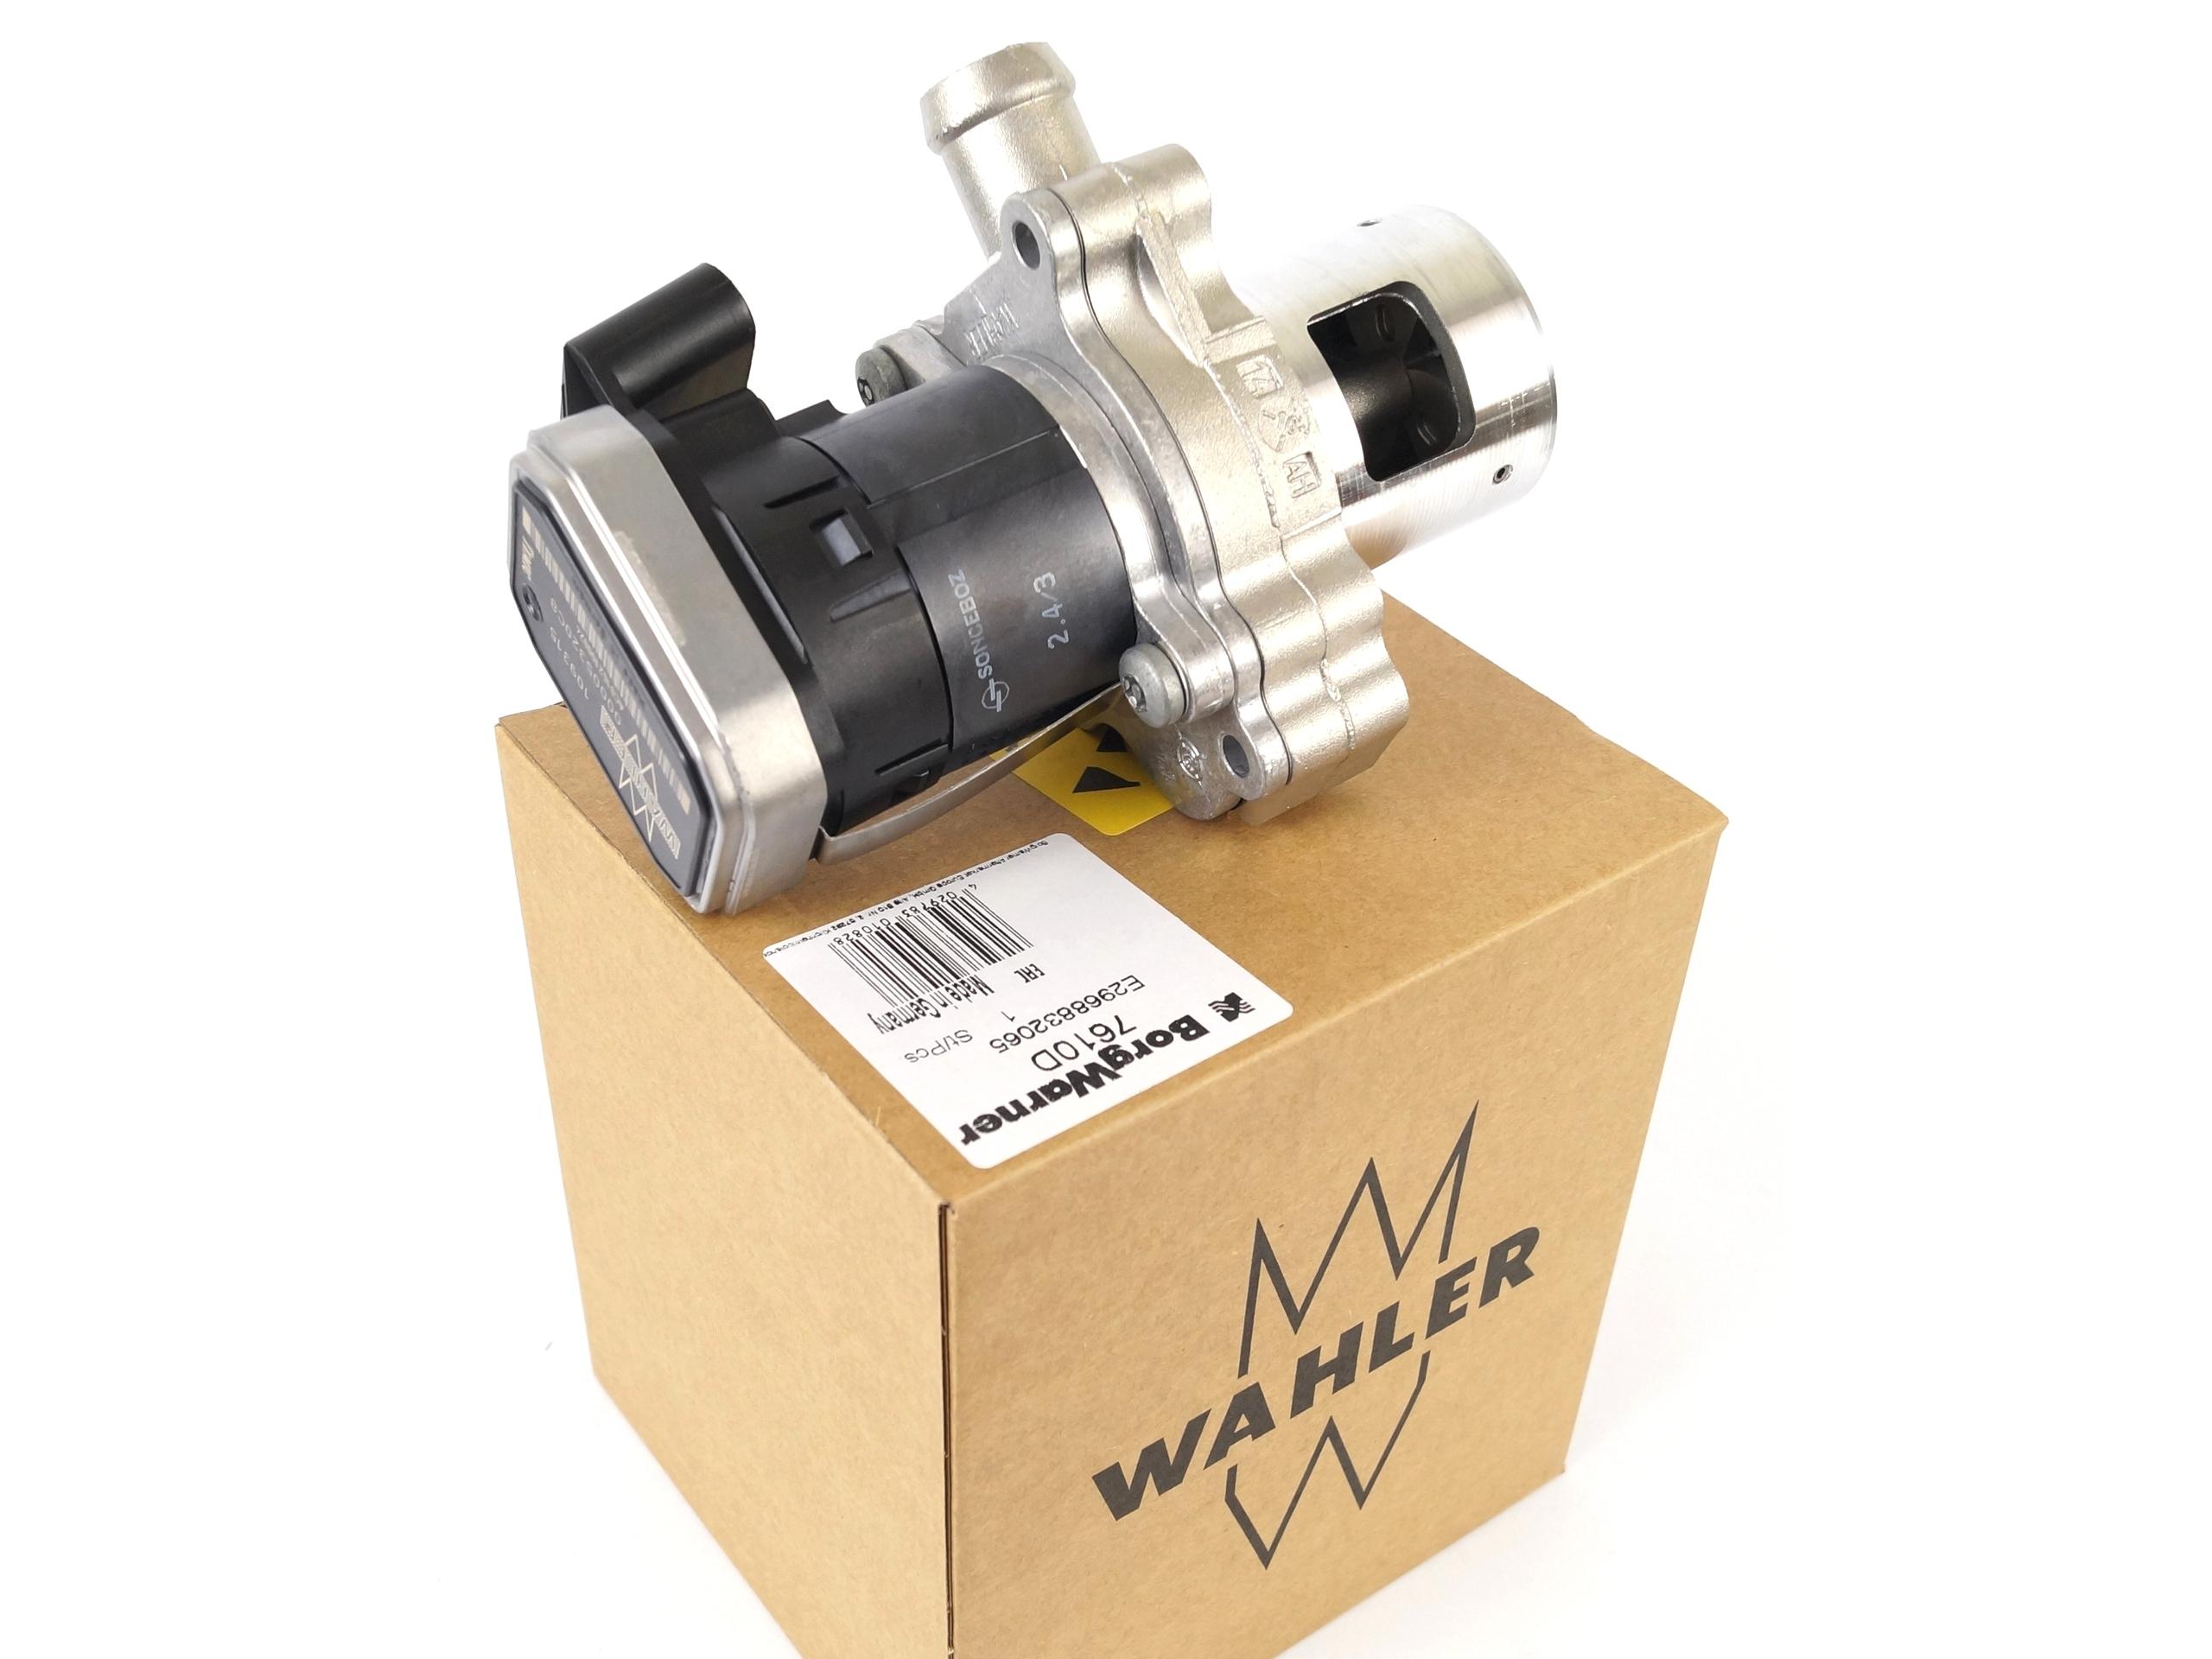 клапан системы рециркуляции ог mercedes sprinter 906 22 cdi wahler